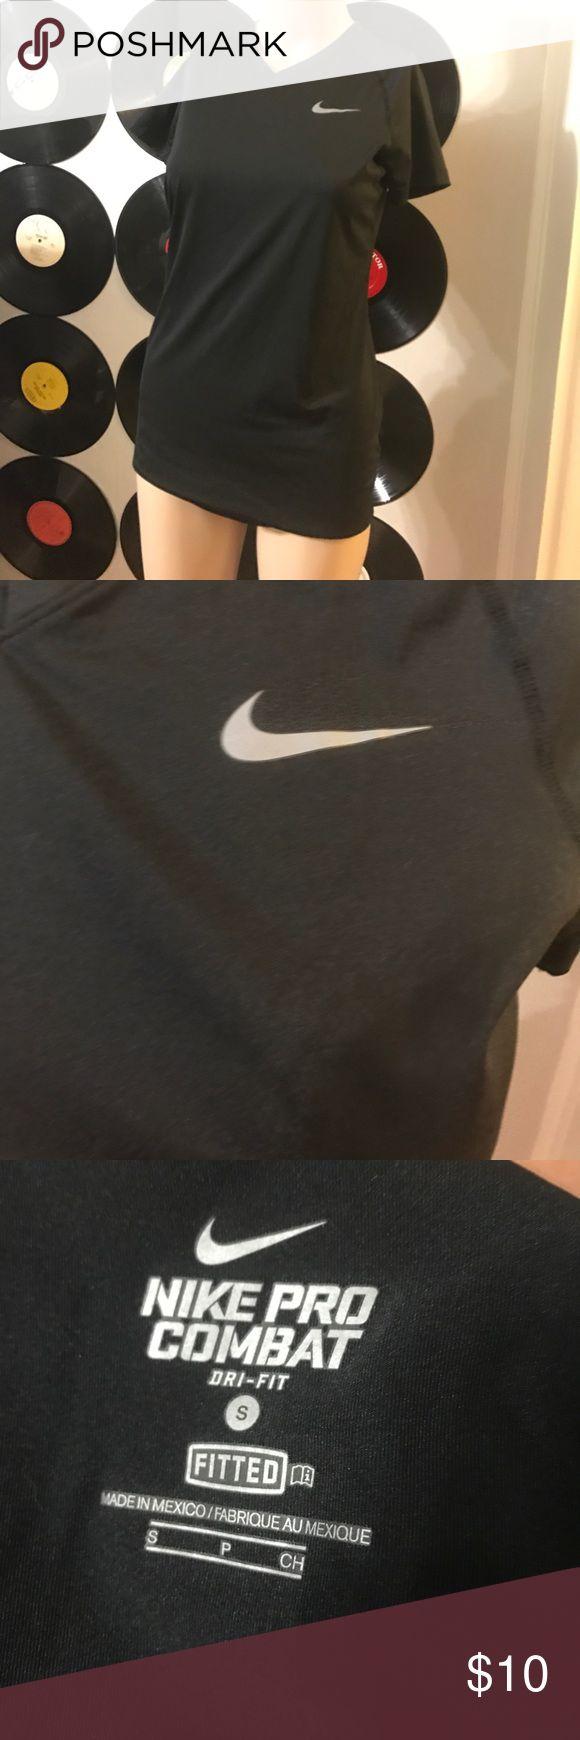 Nike pro combat dri fit small black Nike pro combat dri fit small black. Clean smoke free home 🏡 please make a reasonable offer. Nike Tops Tees - Short Sleeve